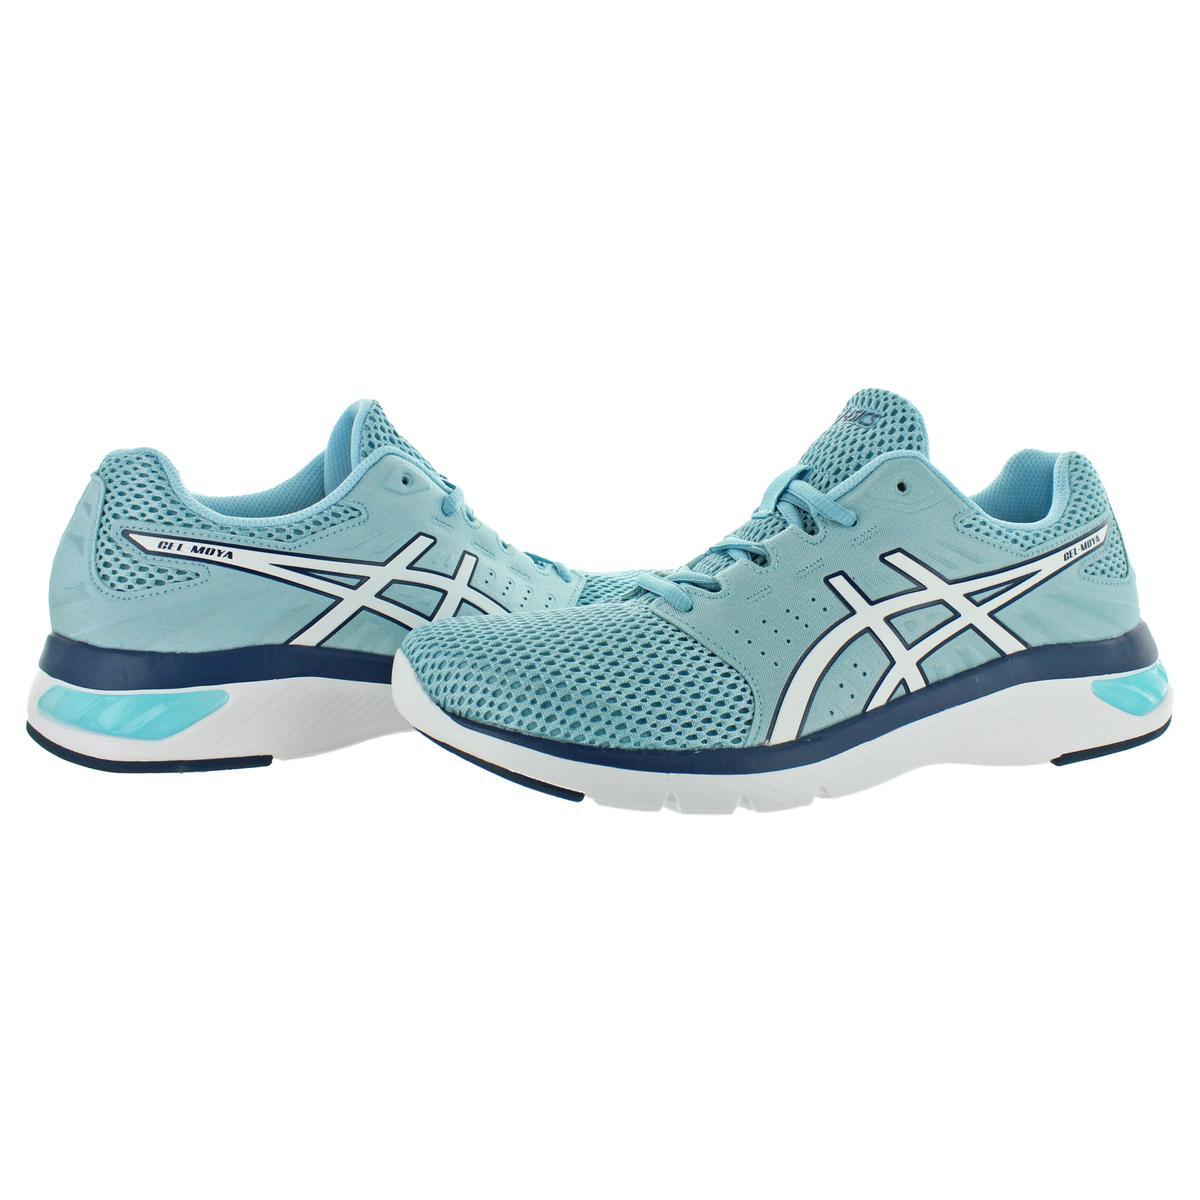 Asics-Womens-Gel-Moya-Blue-Running-Shoes-Sneakers-12-Medium-B-M-BHFO-5296 thumbnail 5